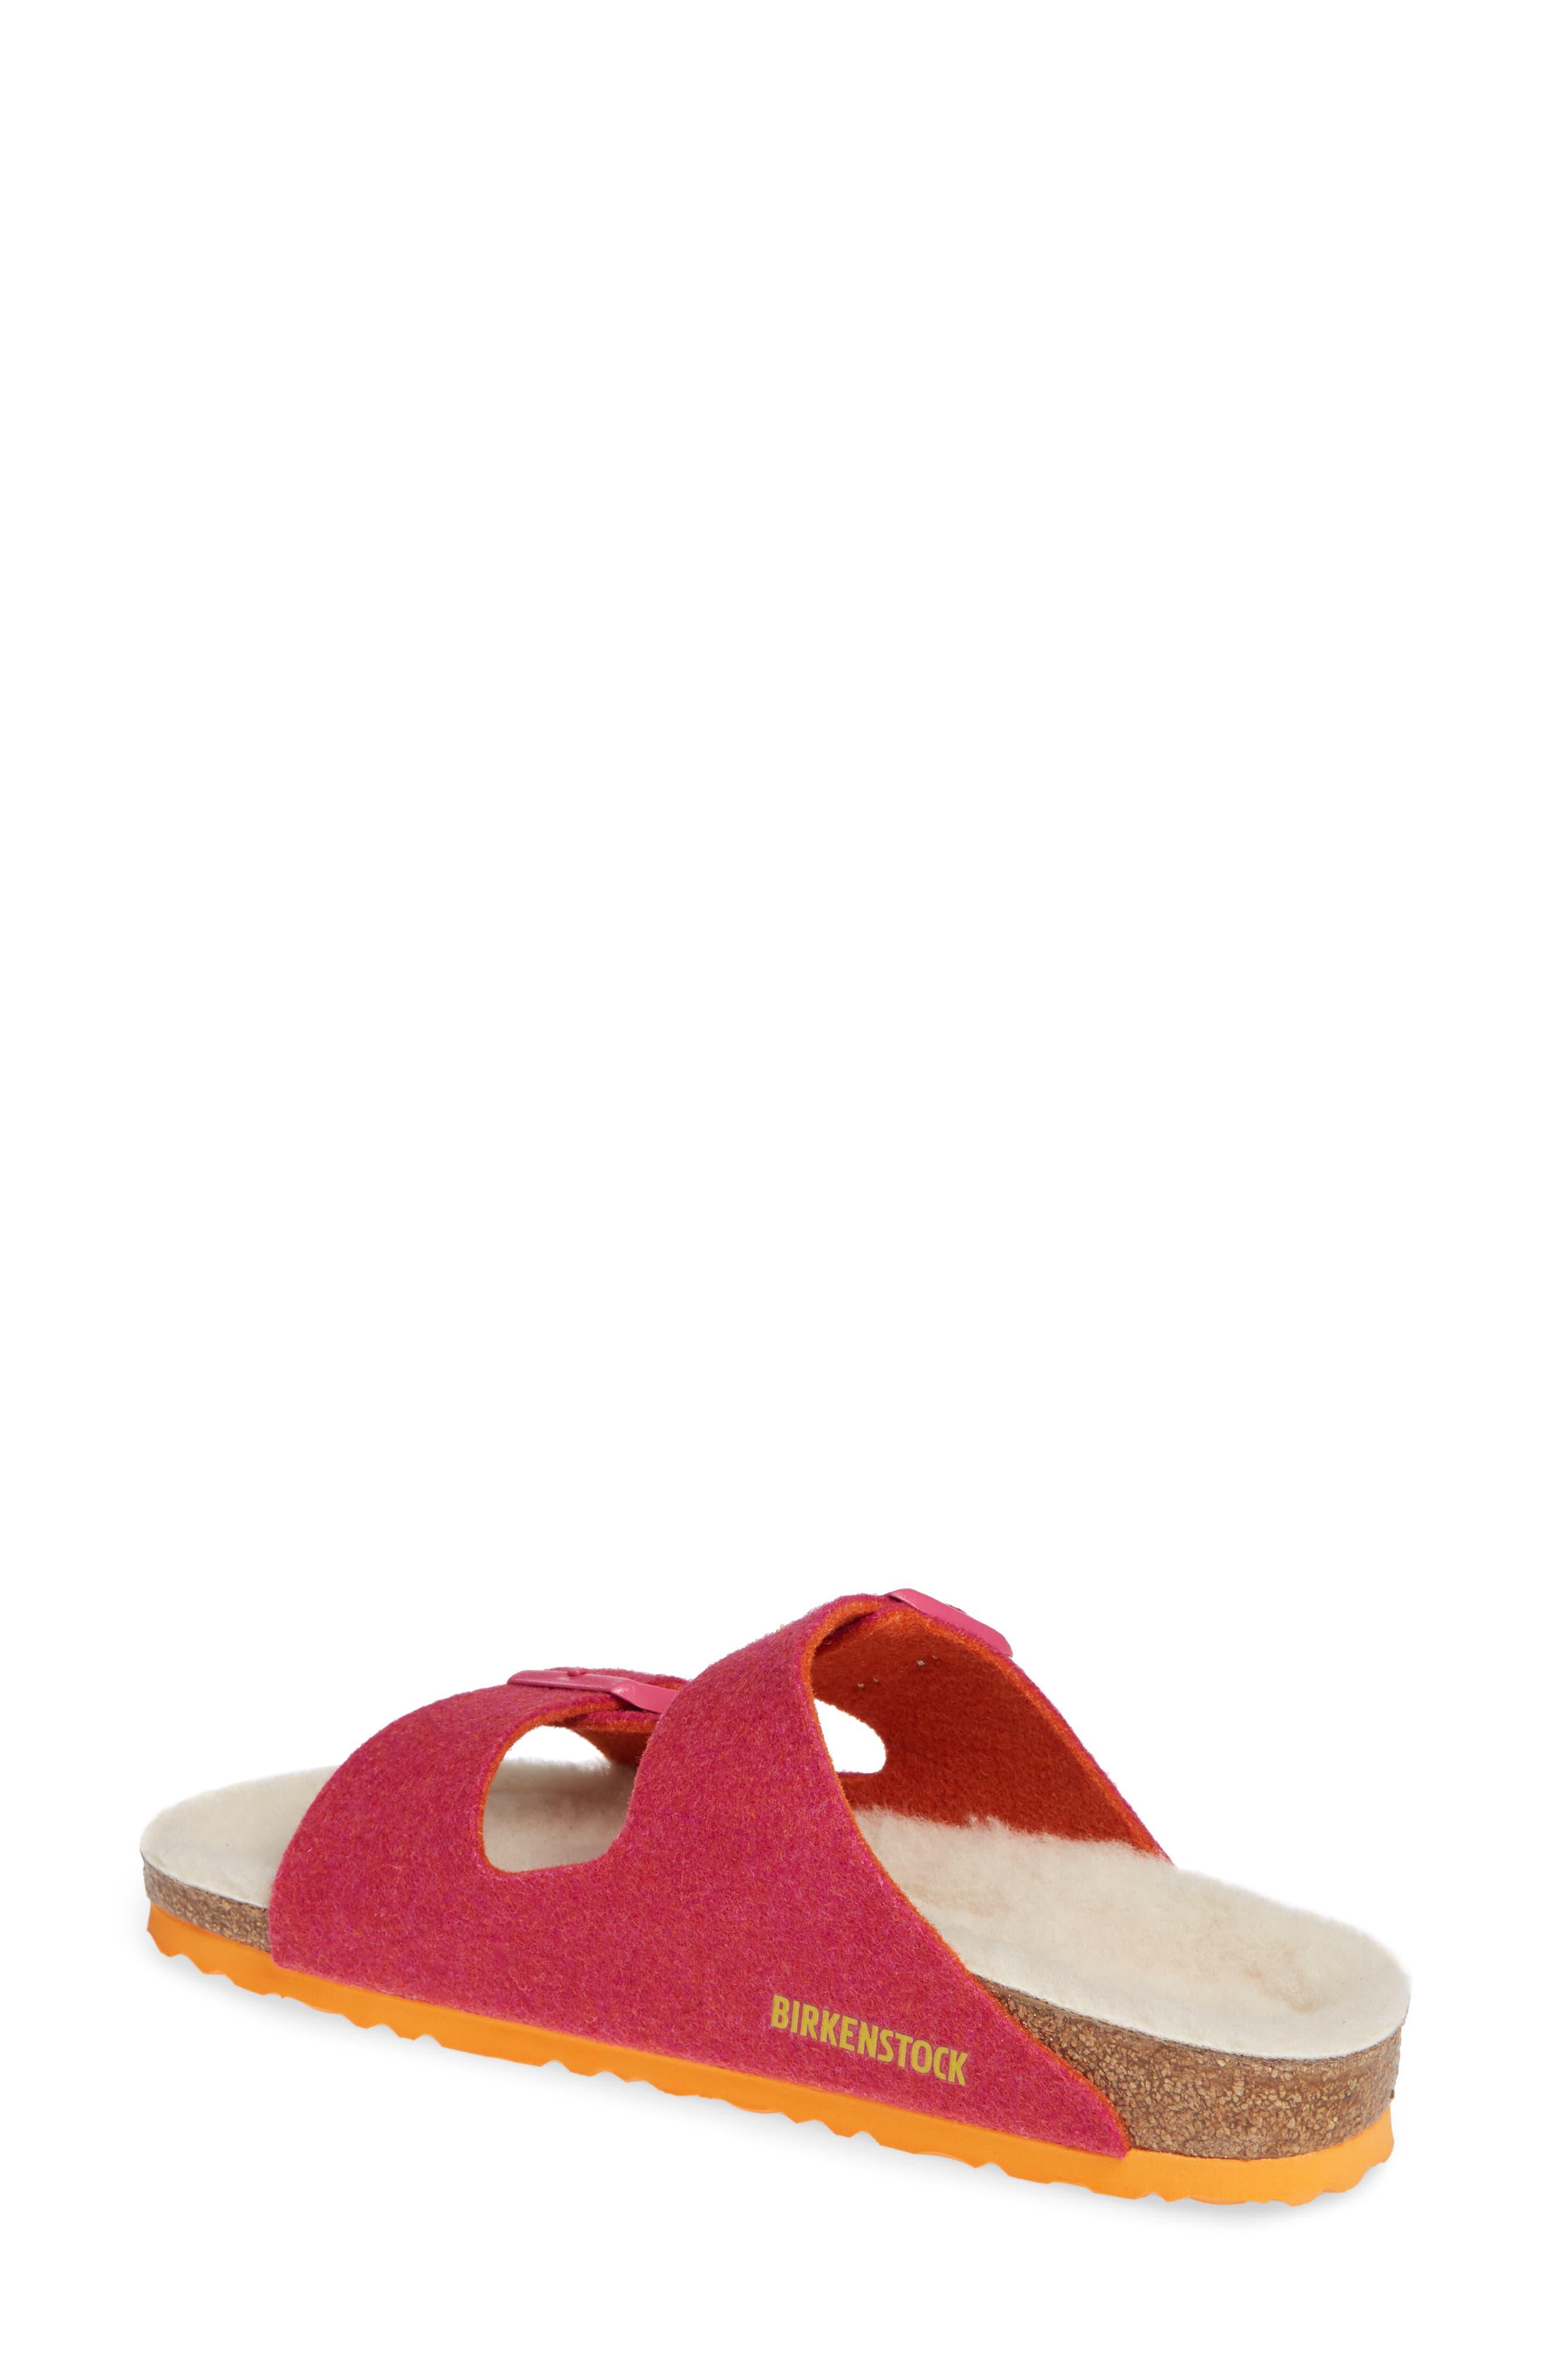 Arizona Happy Slide Sandal,                             Alternate thumbnail 2, color,                             FUCHSIA WOOL